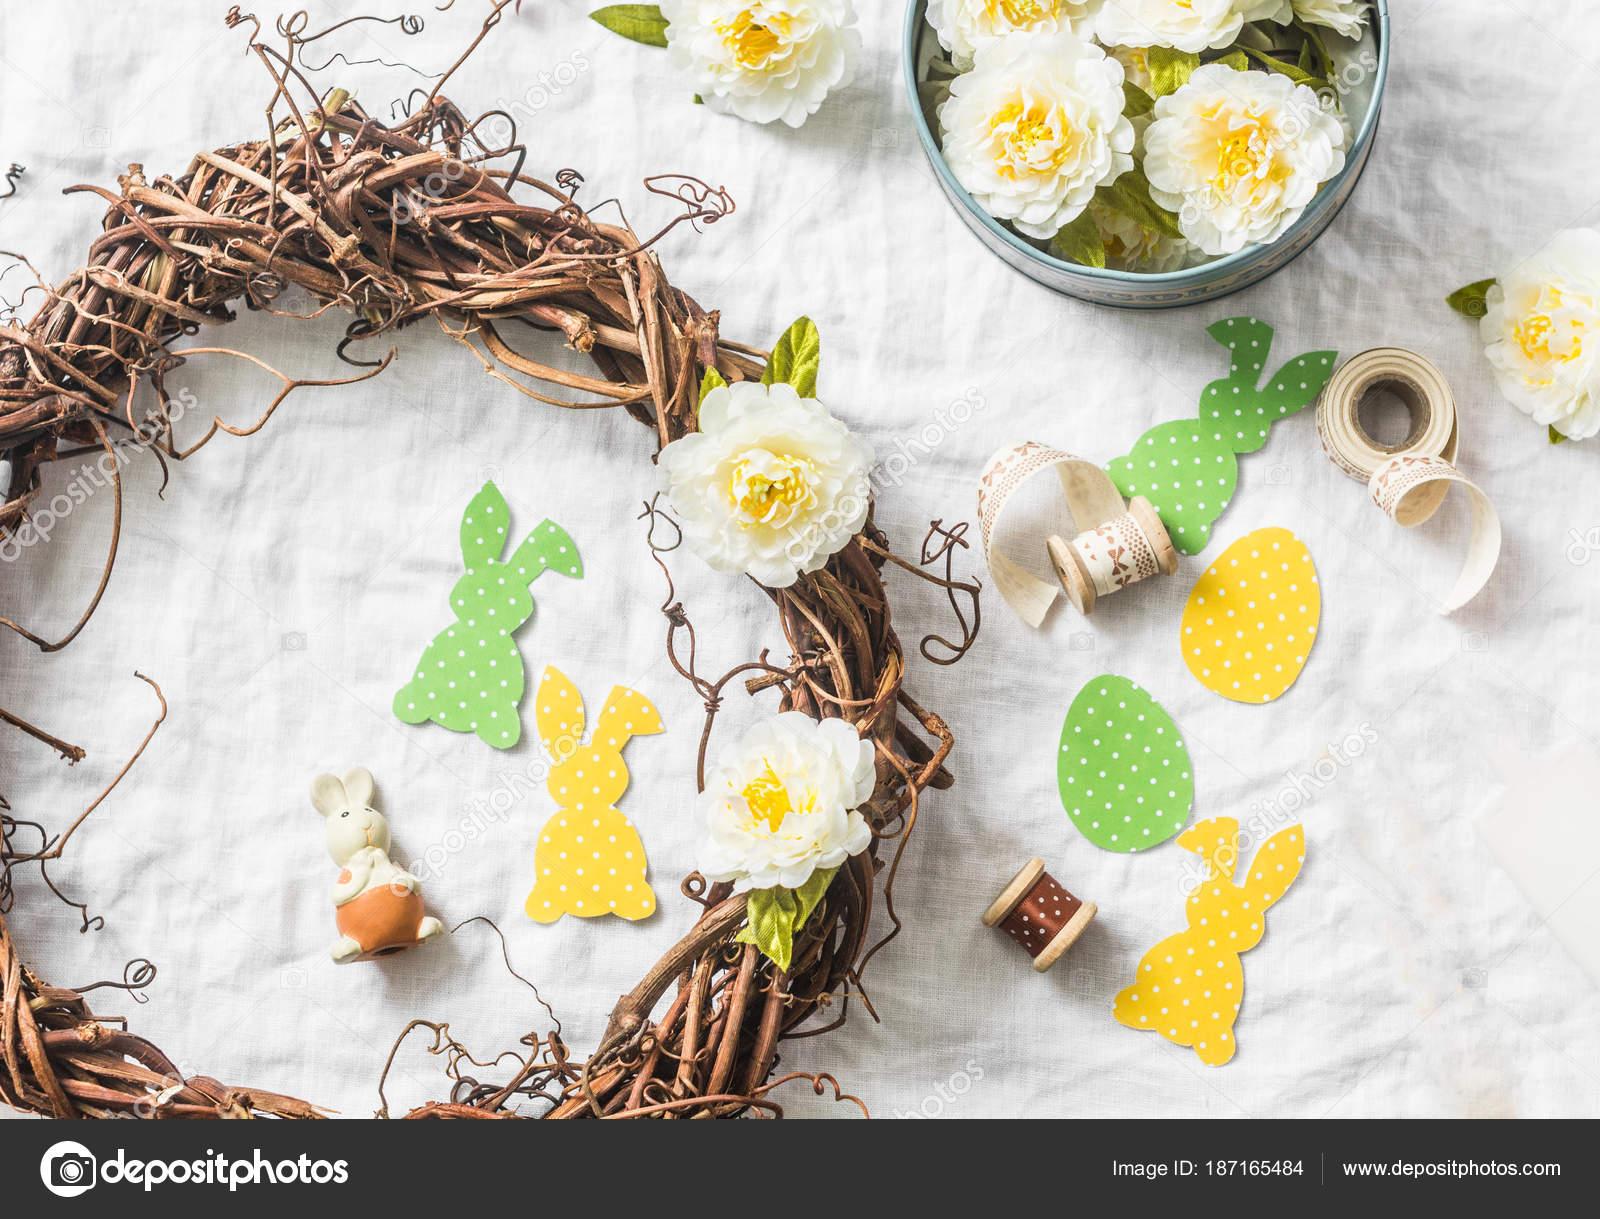 Homemade Easter Wreath Vines Flowers Paper Rabbits Ribbons White